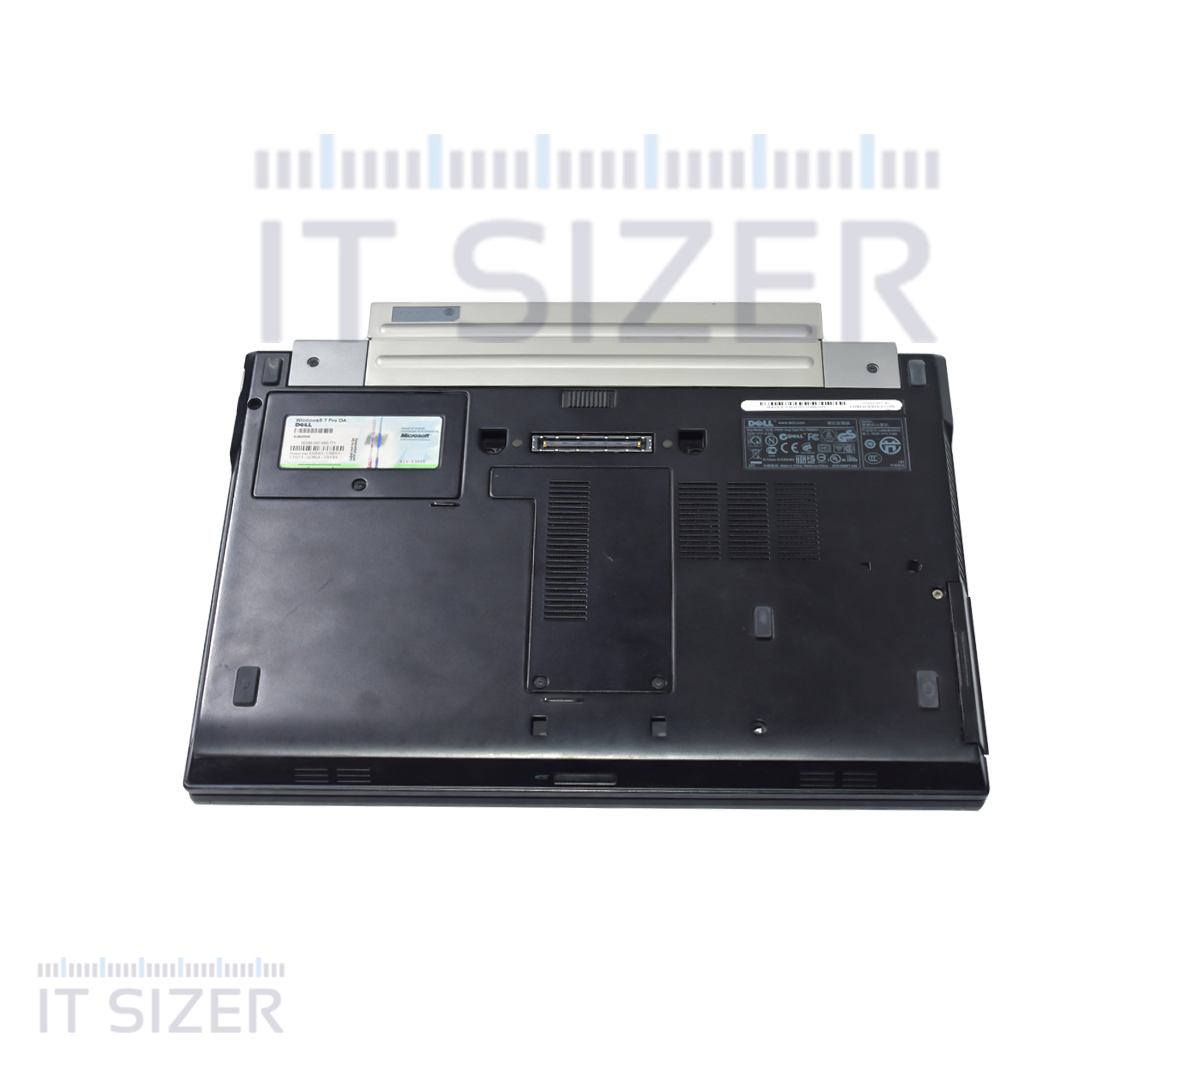 Dell Latitude E4310 Business Laptop, INTEL(R)CORE(TM) I5-M 520 CPU, 4GB DDR3 SODIMM RAM, 500GB SATA 2.5 Hard, 13.3 inch Display (Renewed)